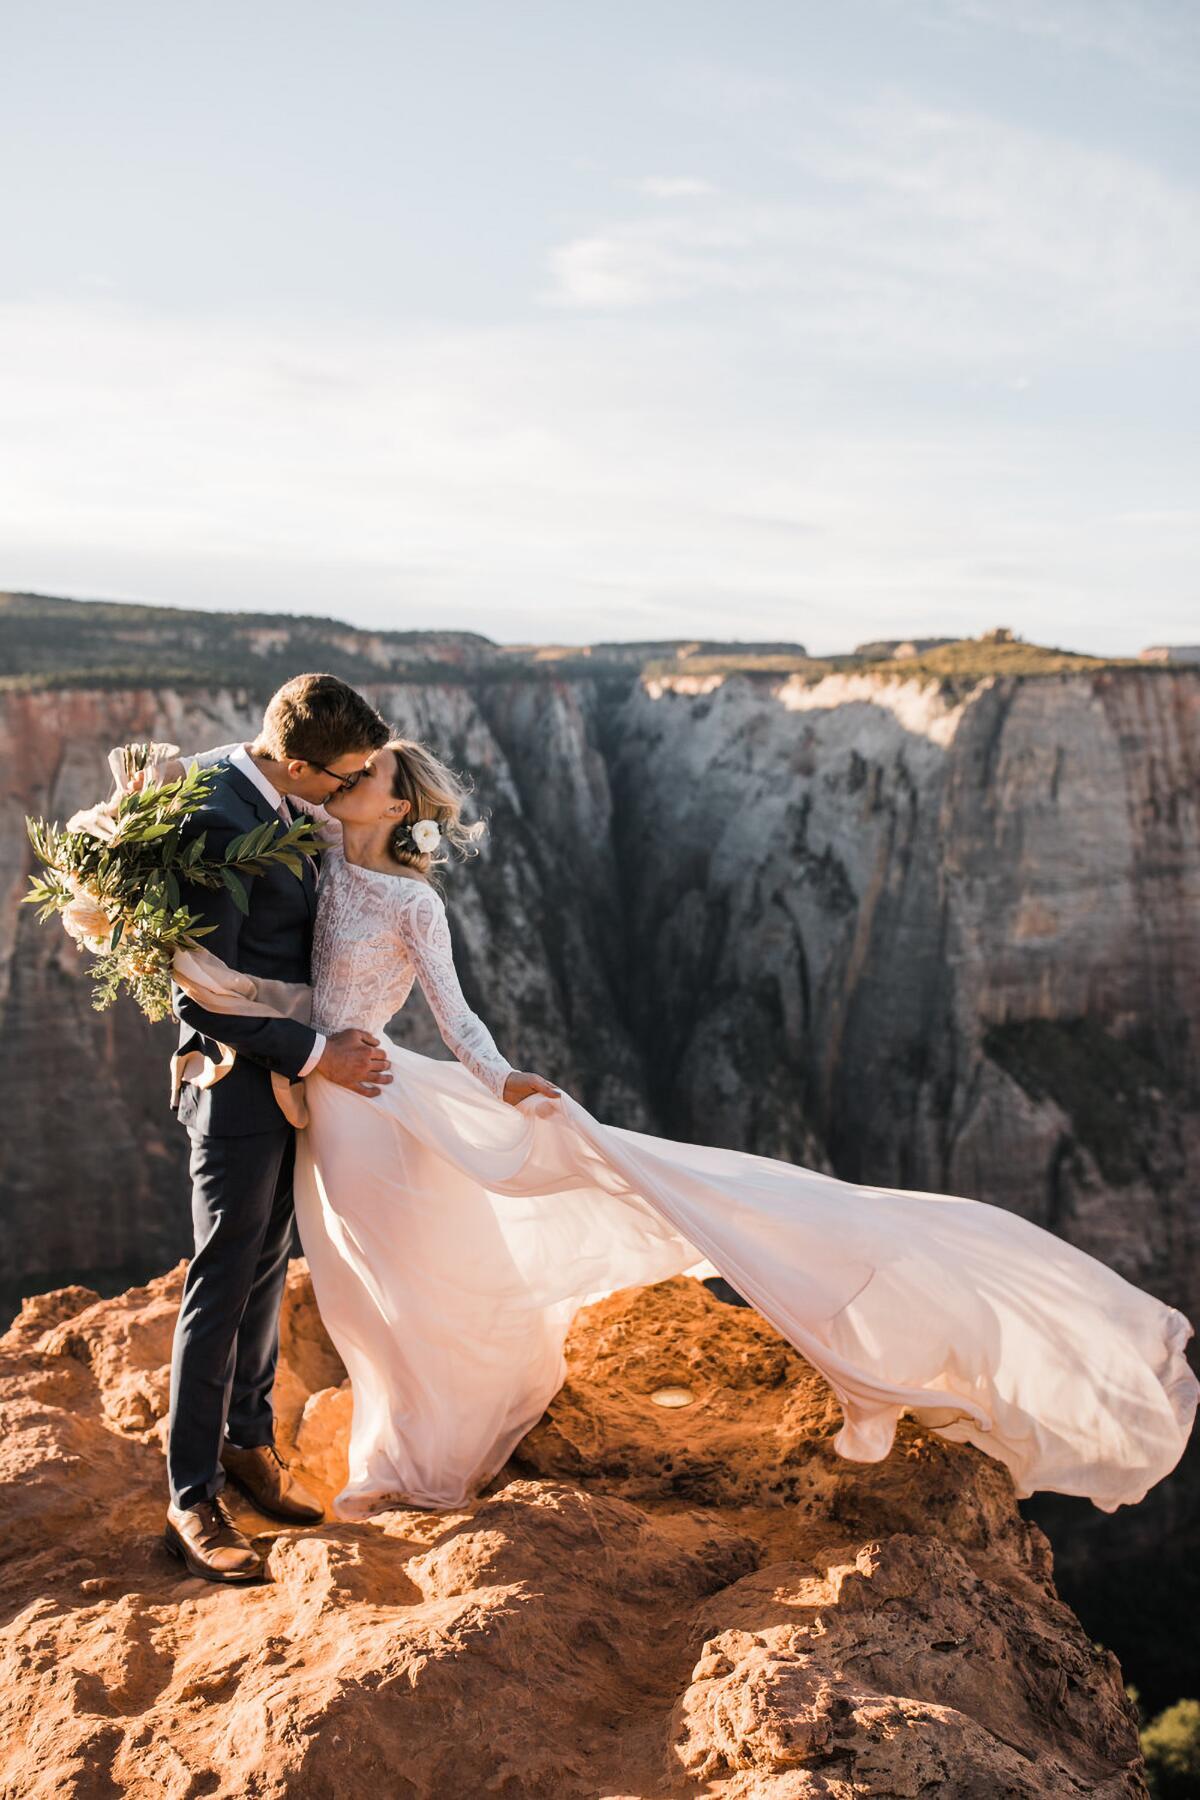 03_AdventurePhotoEssay__ErinandMarshall_3.) Zion-National-Park-Hiking-Elopement-Wedding-Hearnes-Photography-51